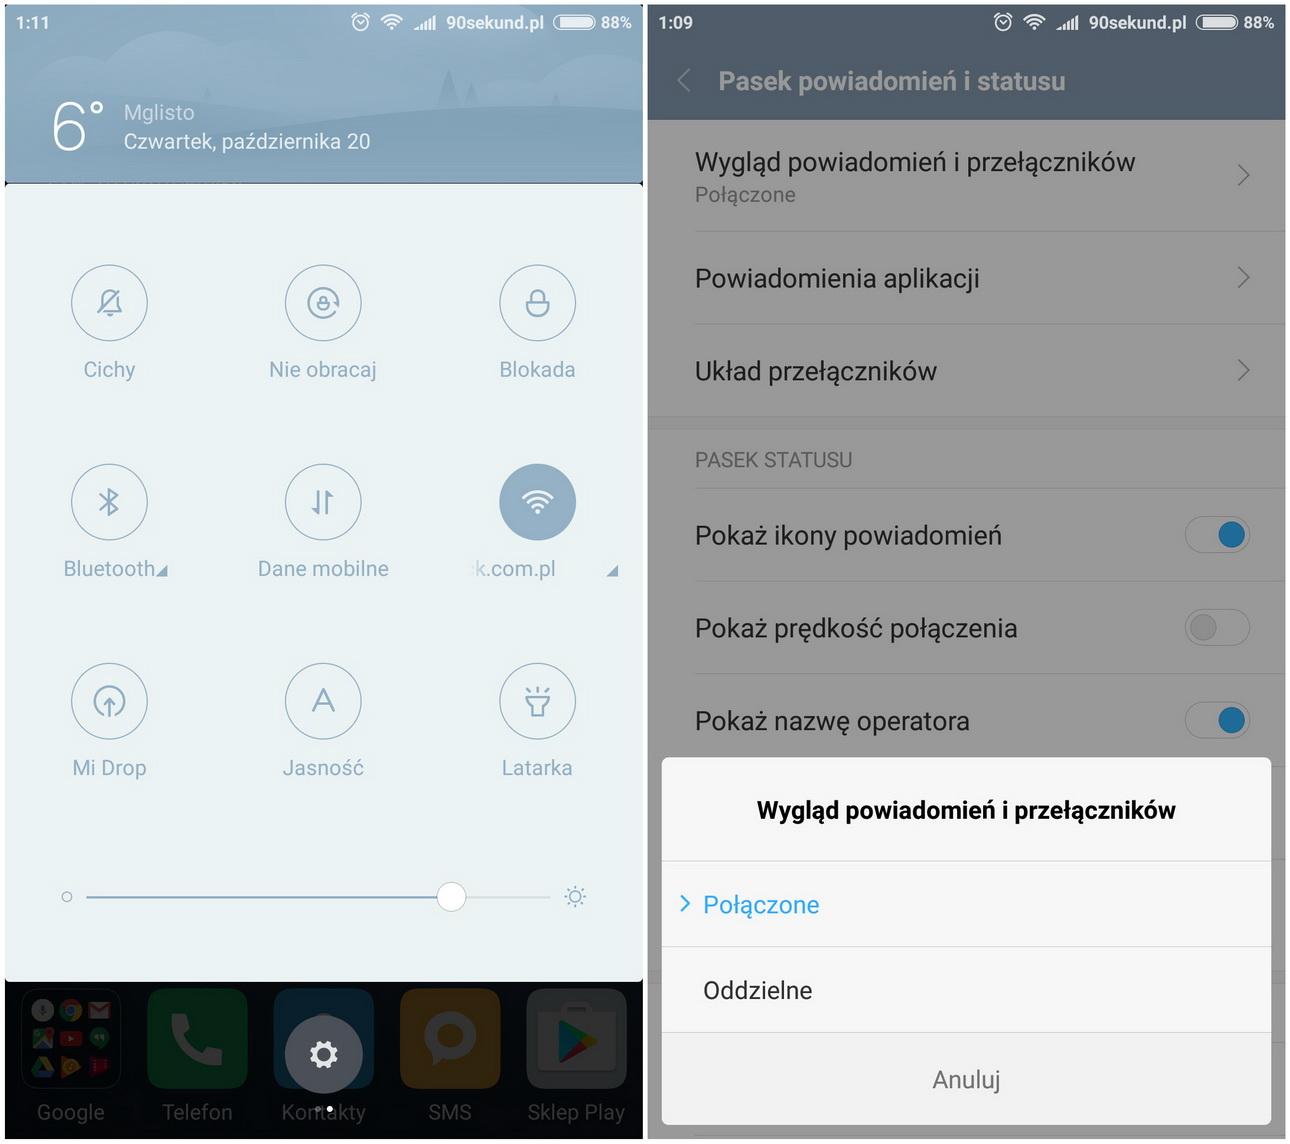 Xiaomi Mi5 - Pasek powiadomień - recenzja 90sekund.pl